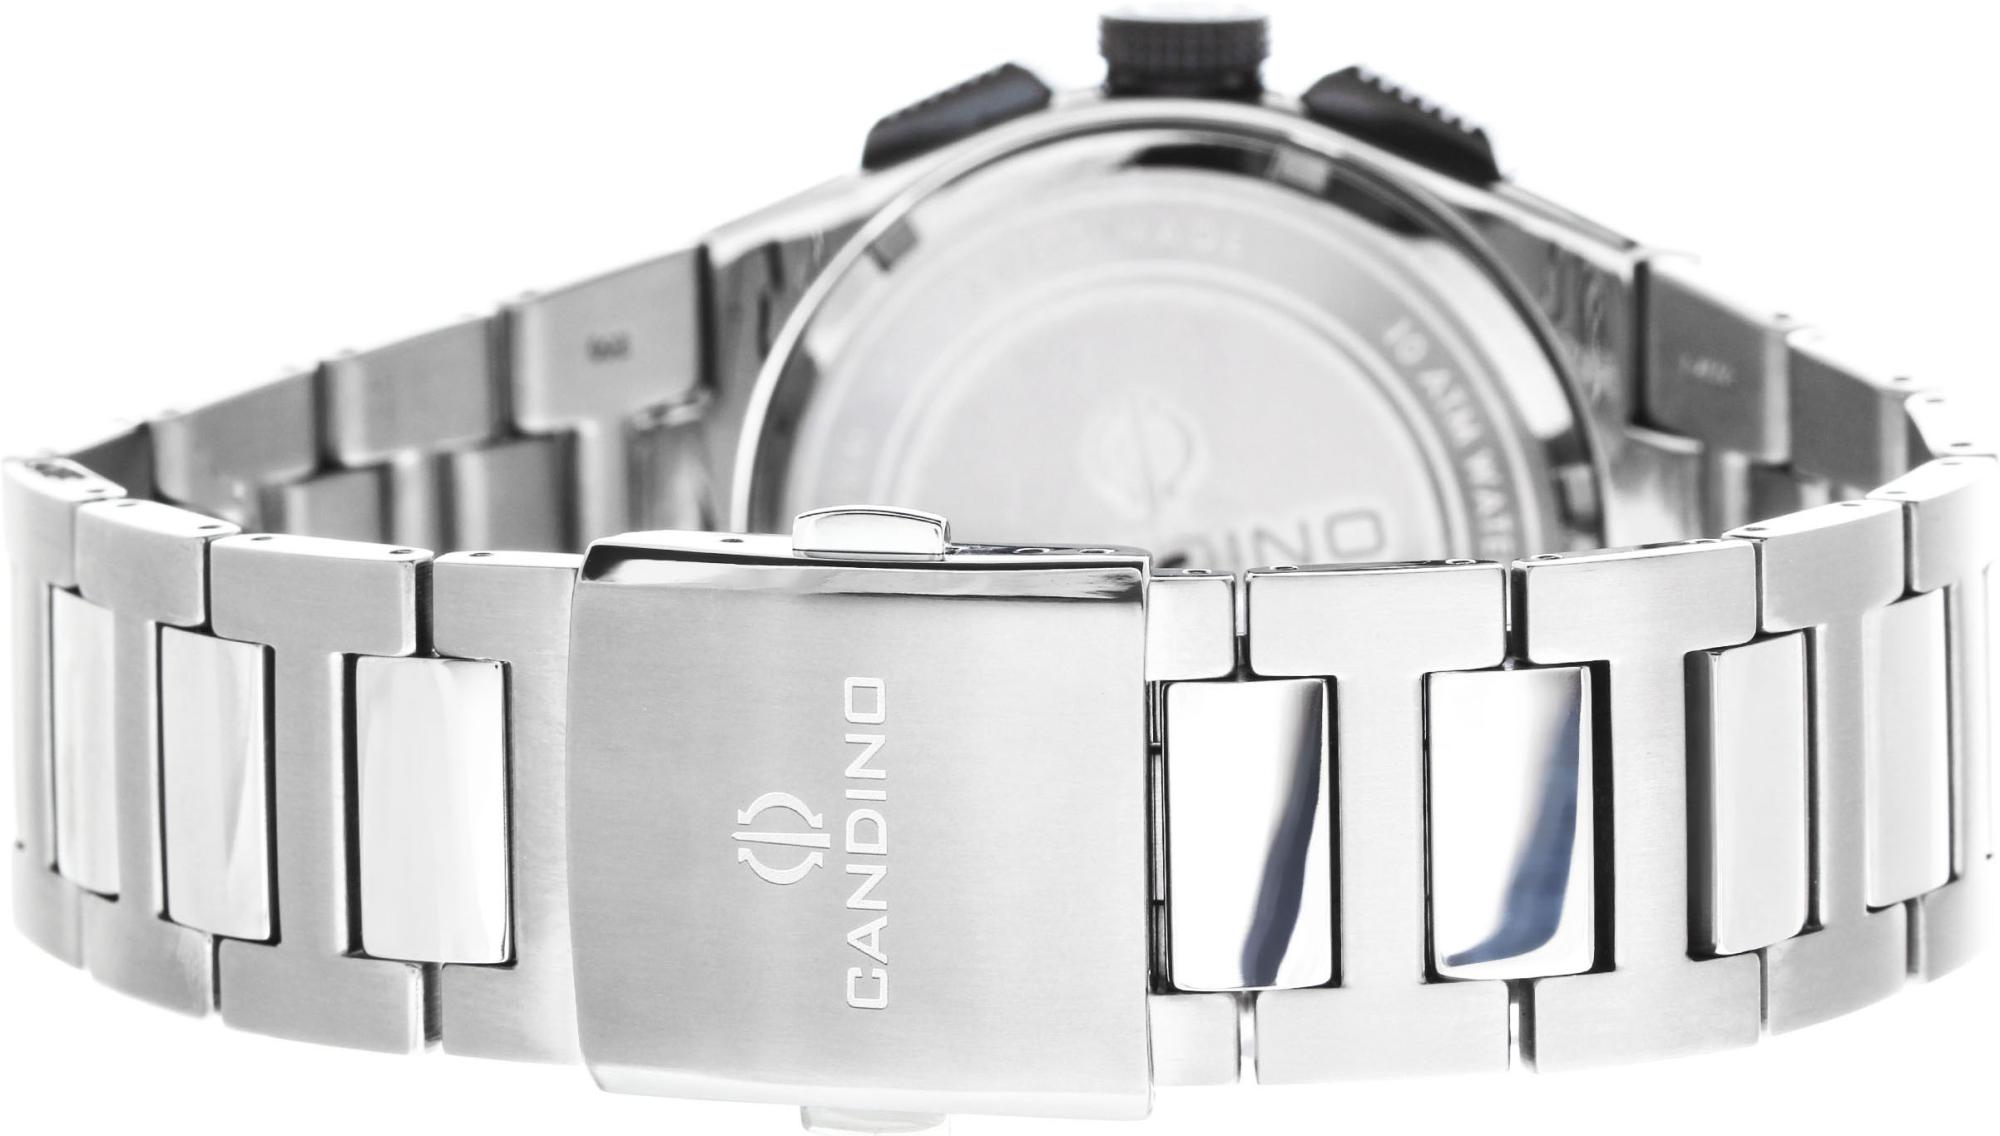 Candino Titanium C4603/4Наручные часы<br>Швейцарские часы Candino Titanium C4603/4<br><br>Пол: Мужские<br>Страна-производитель: Швейцария<br>Механизм: Кварцевый<br>Материал корпуса: Титан<br>Материал ремня/браслета: Титан<br>Водозащита, диапазон: None<br>Стекло: Сапфировое<br>Толщина корпуса: None<br>Стиль: None